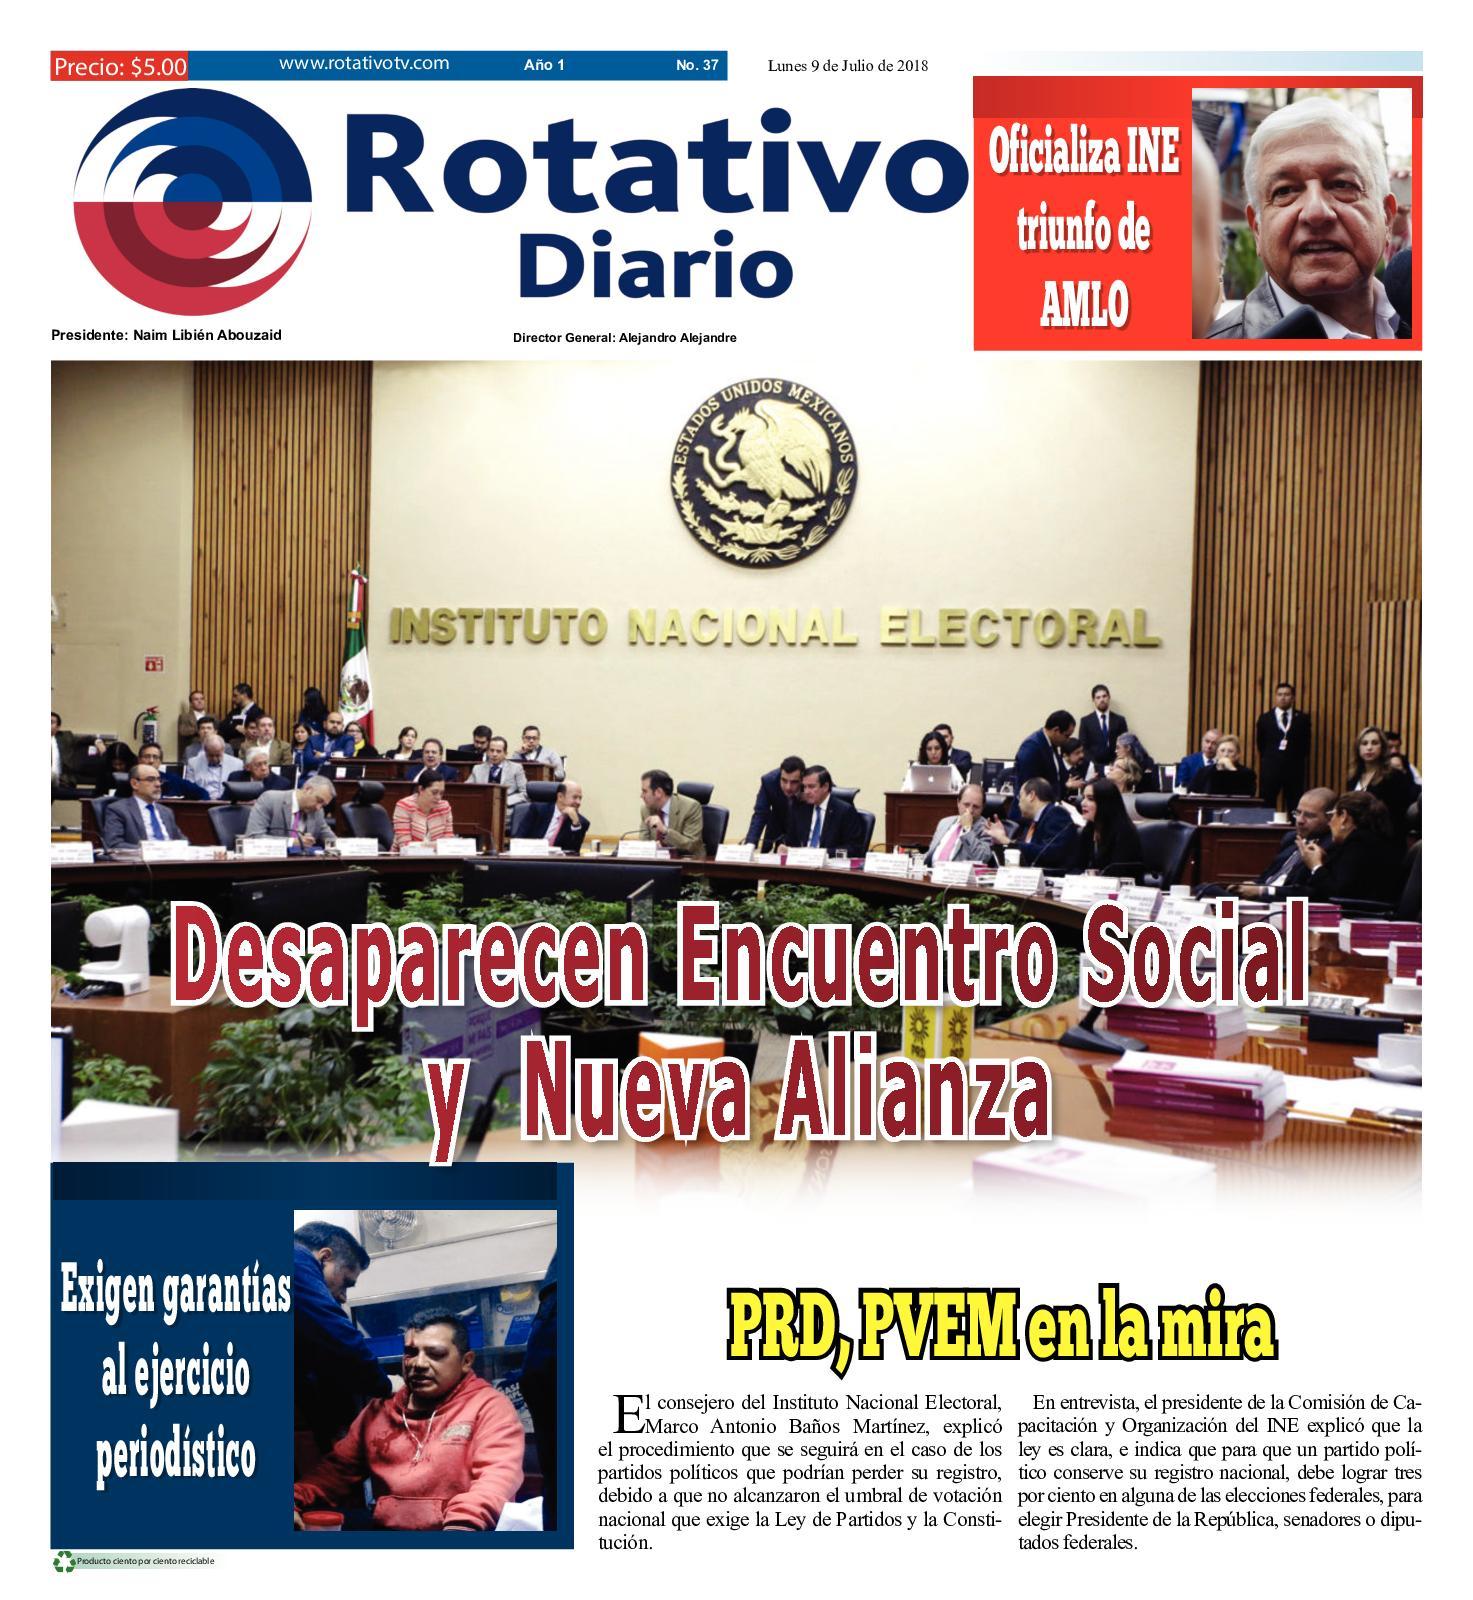 Calaméo - Rotativo 9 Julio Numero 37 Okok555555